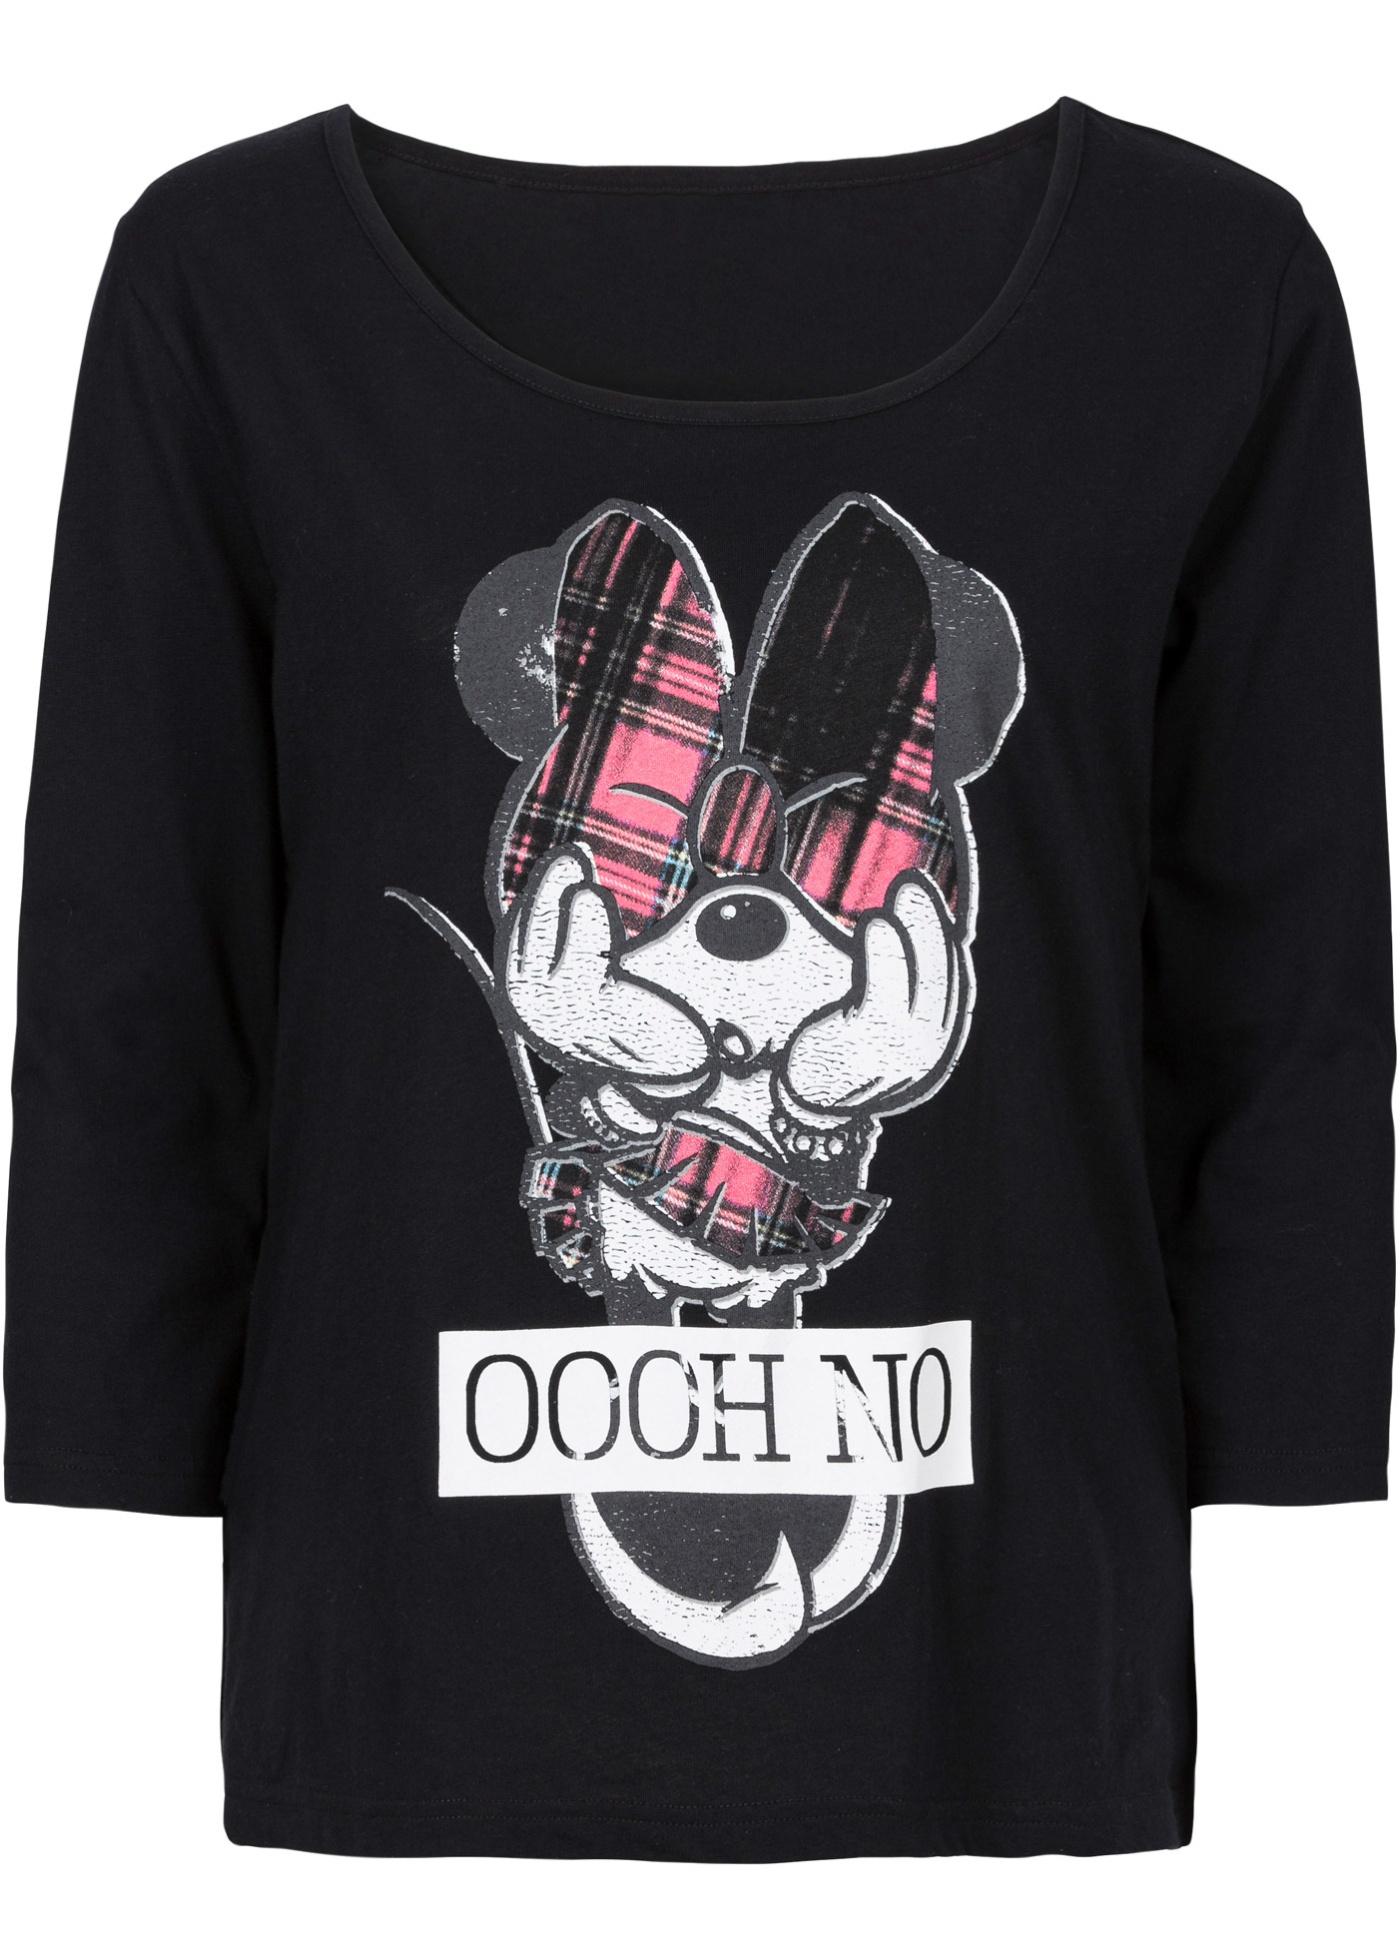 T-shirt mickey mouse noir manches mi-longues...